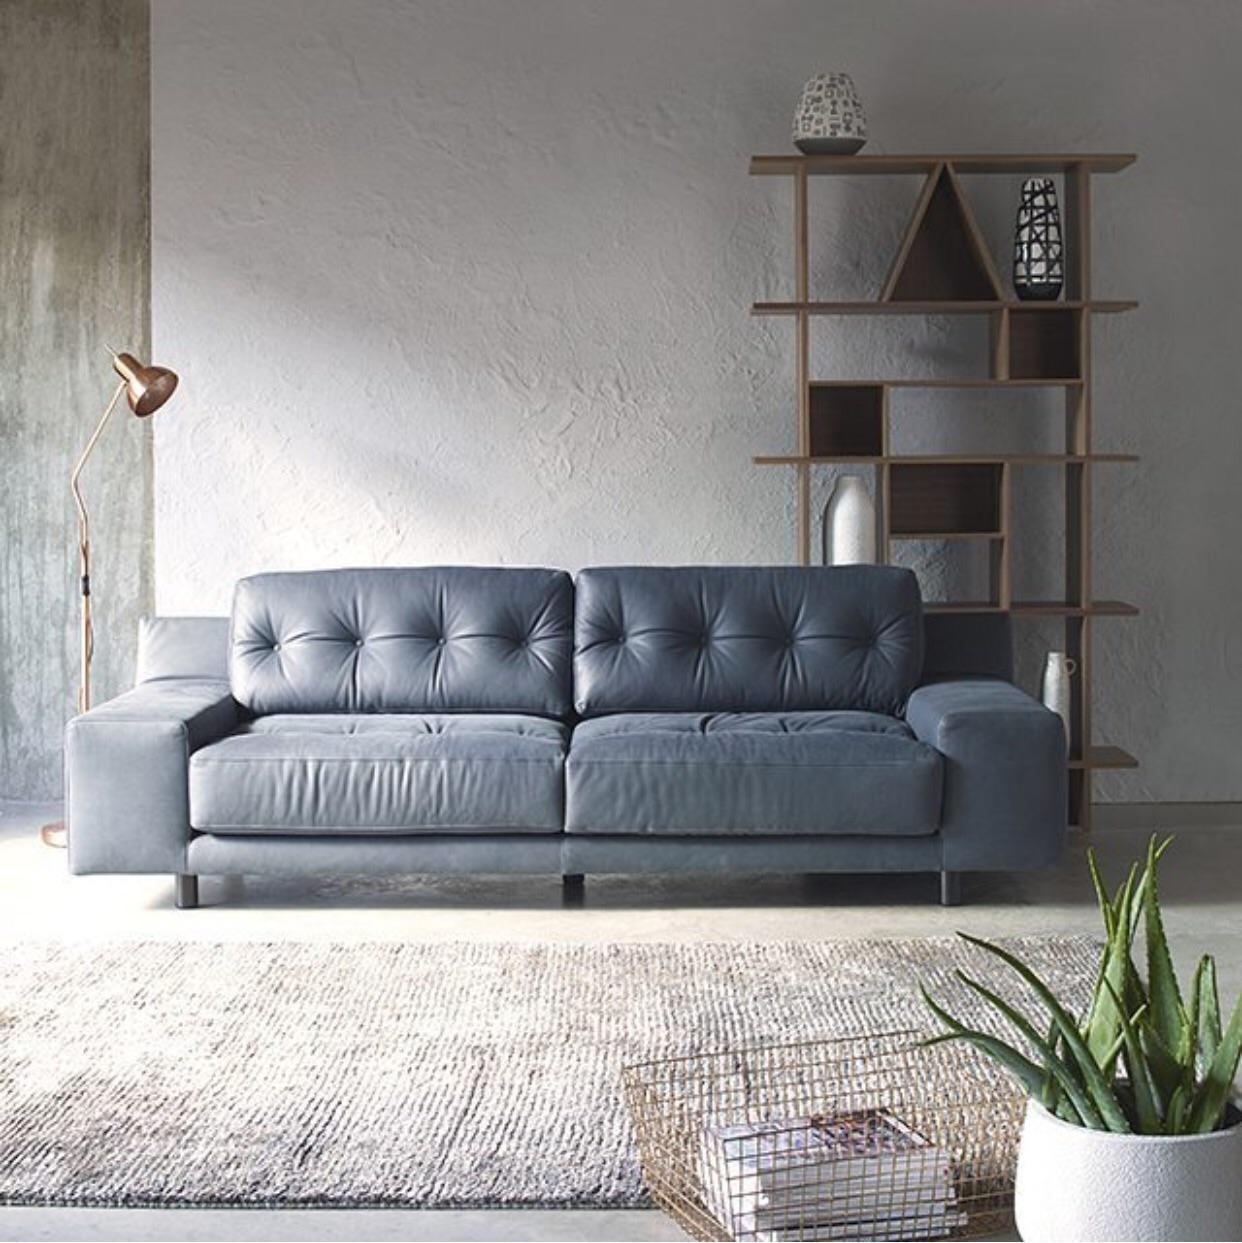 Habitat has this really special three seater settee the Hendricks sofa    http://www.habitat.co.uk/hendricks-charcoal-fabric-3-seater-sofa-289842